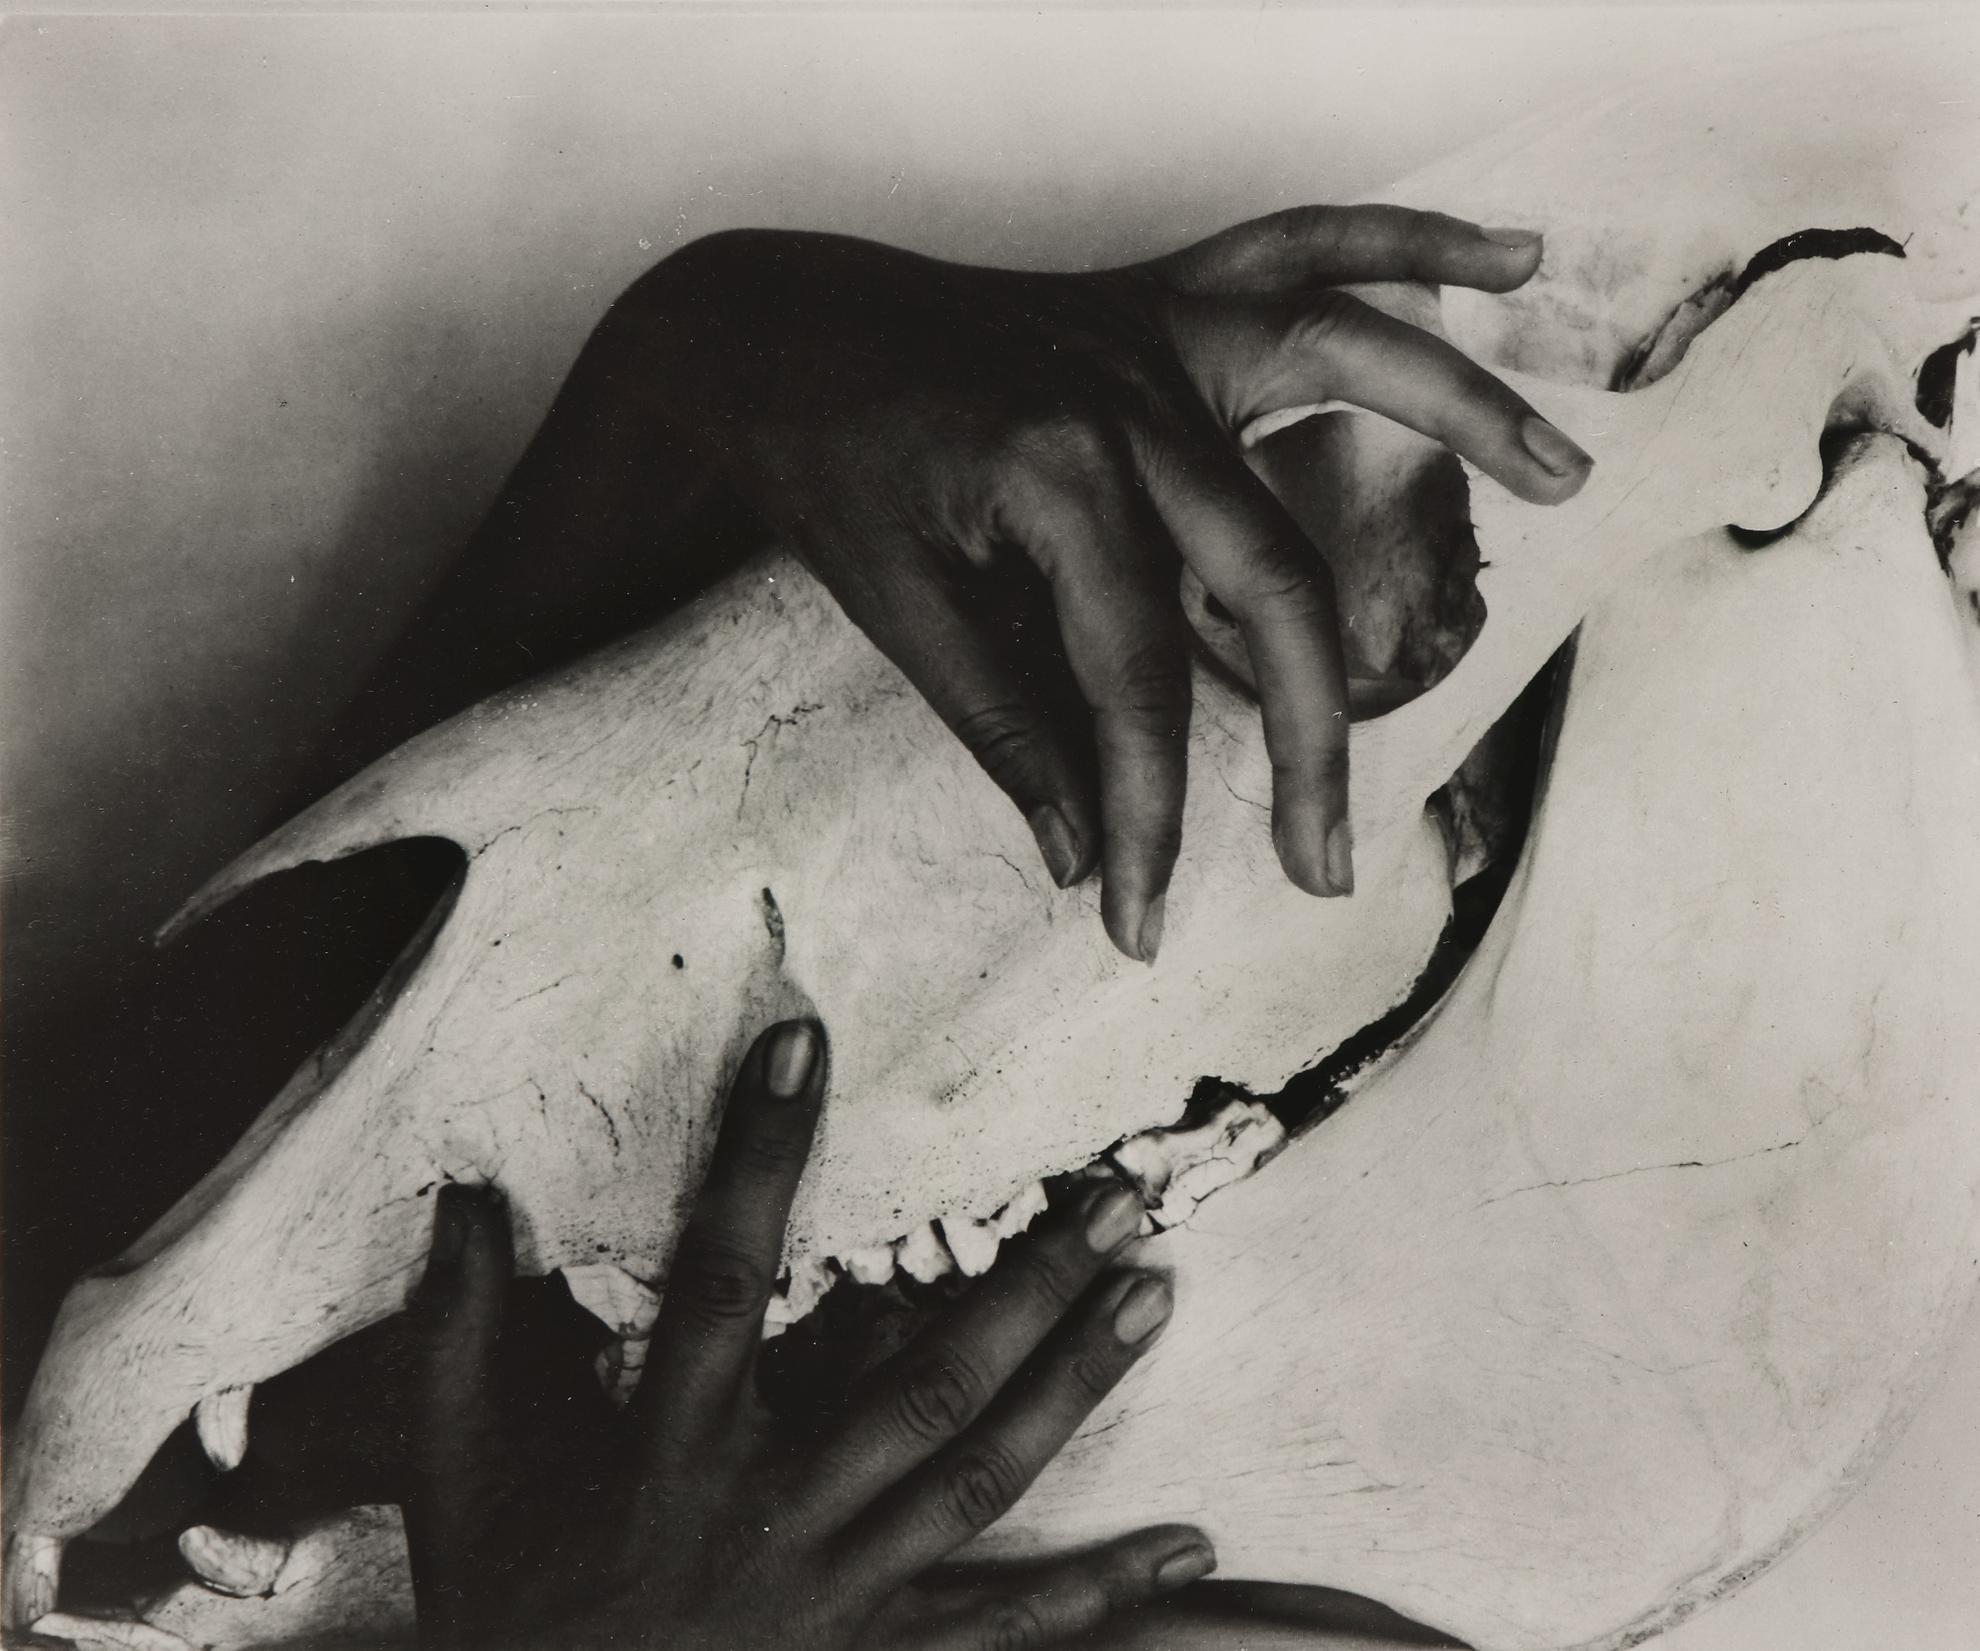 Alfred Stieglitz-Georgia Okeeffe - Hands And Horse Skull-1931